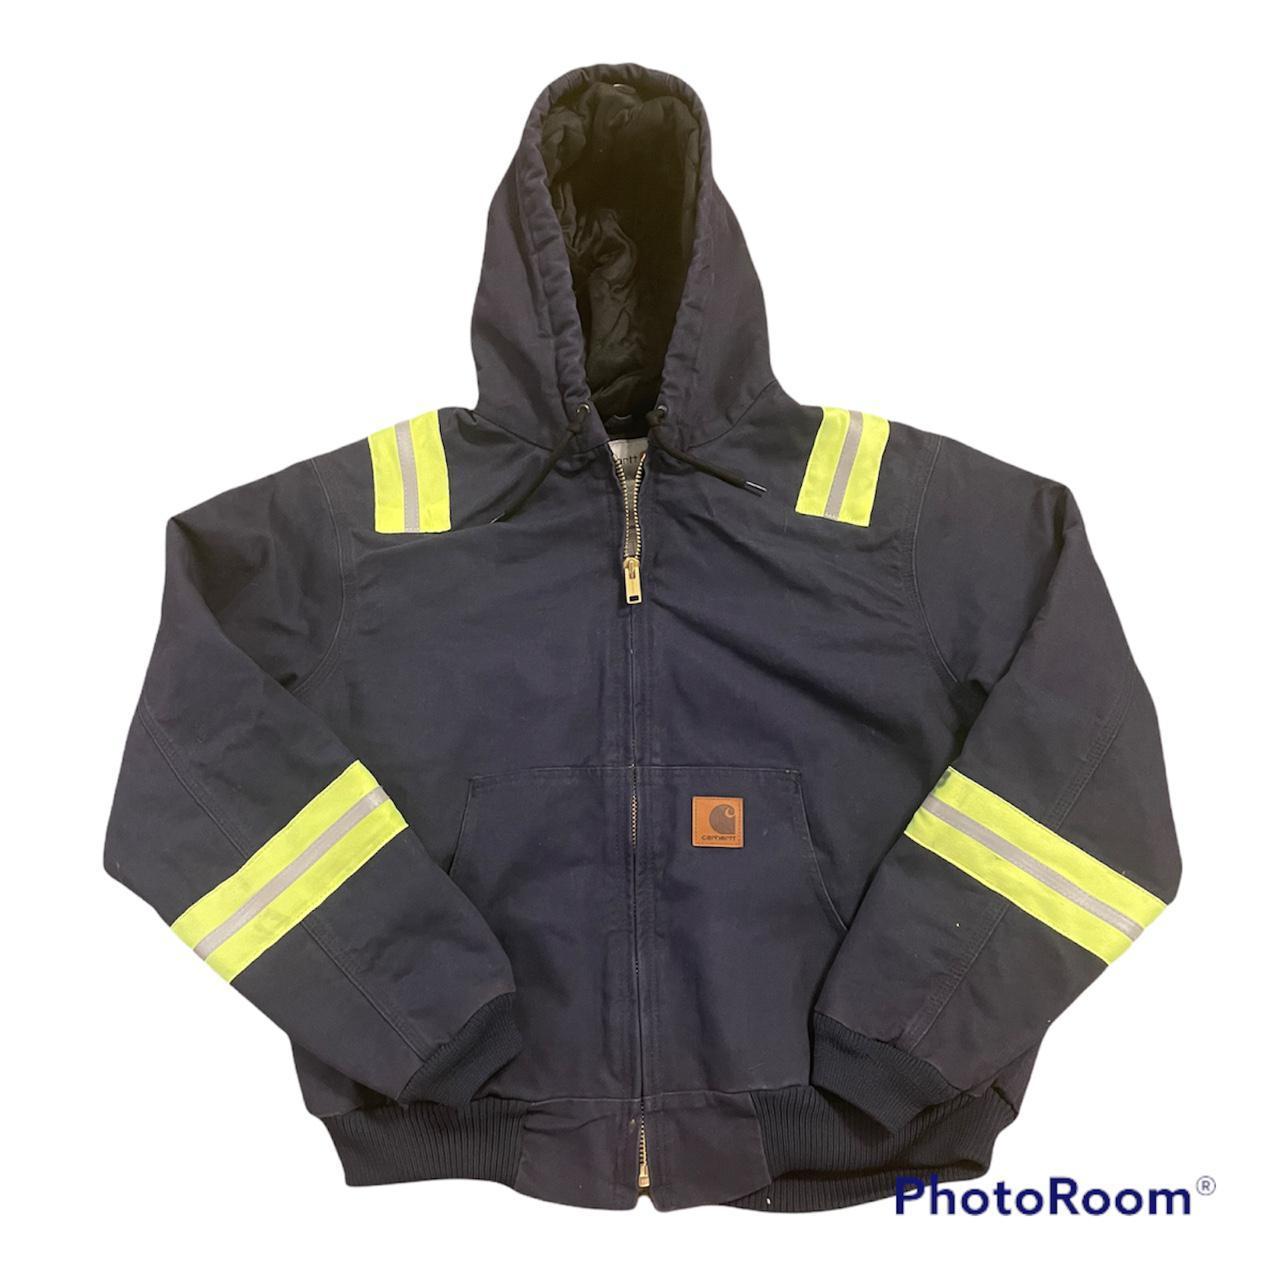 Product Image 1 - carhartt workwear jacket with reflective